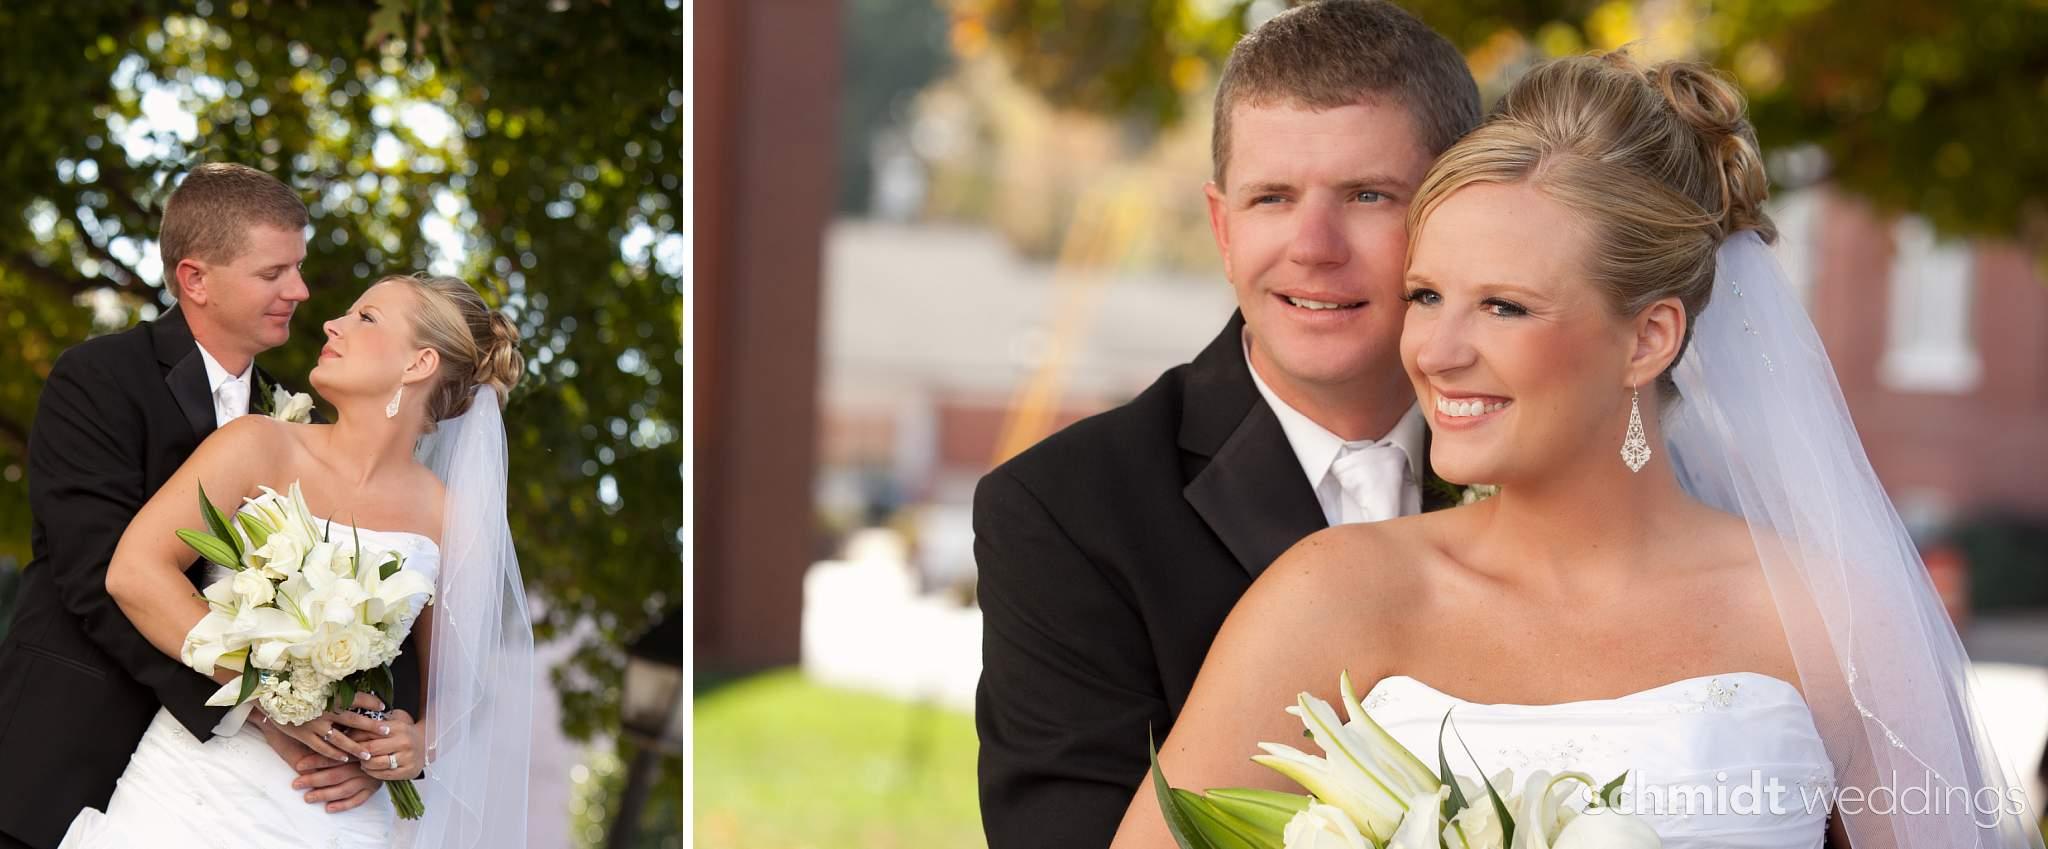 bride and groom couple portrait ideas - schmidtweddings